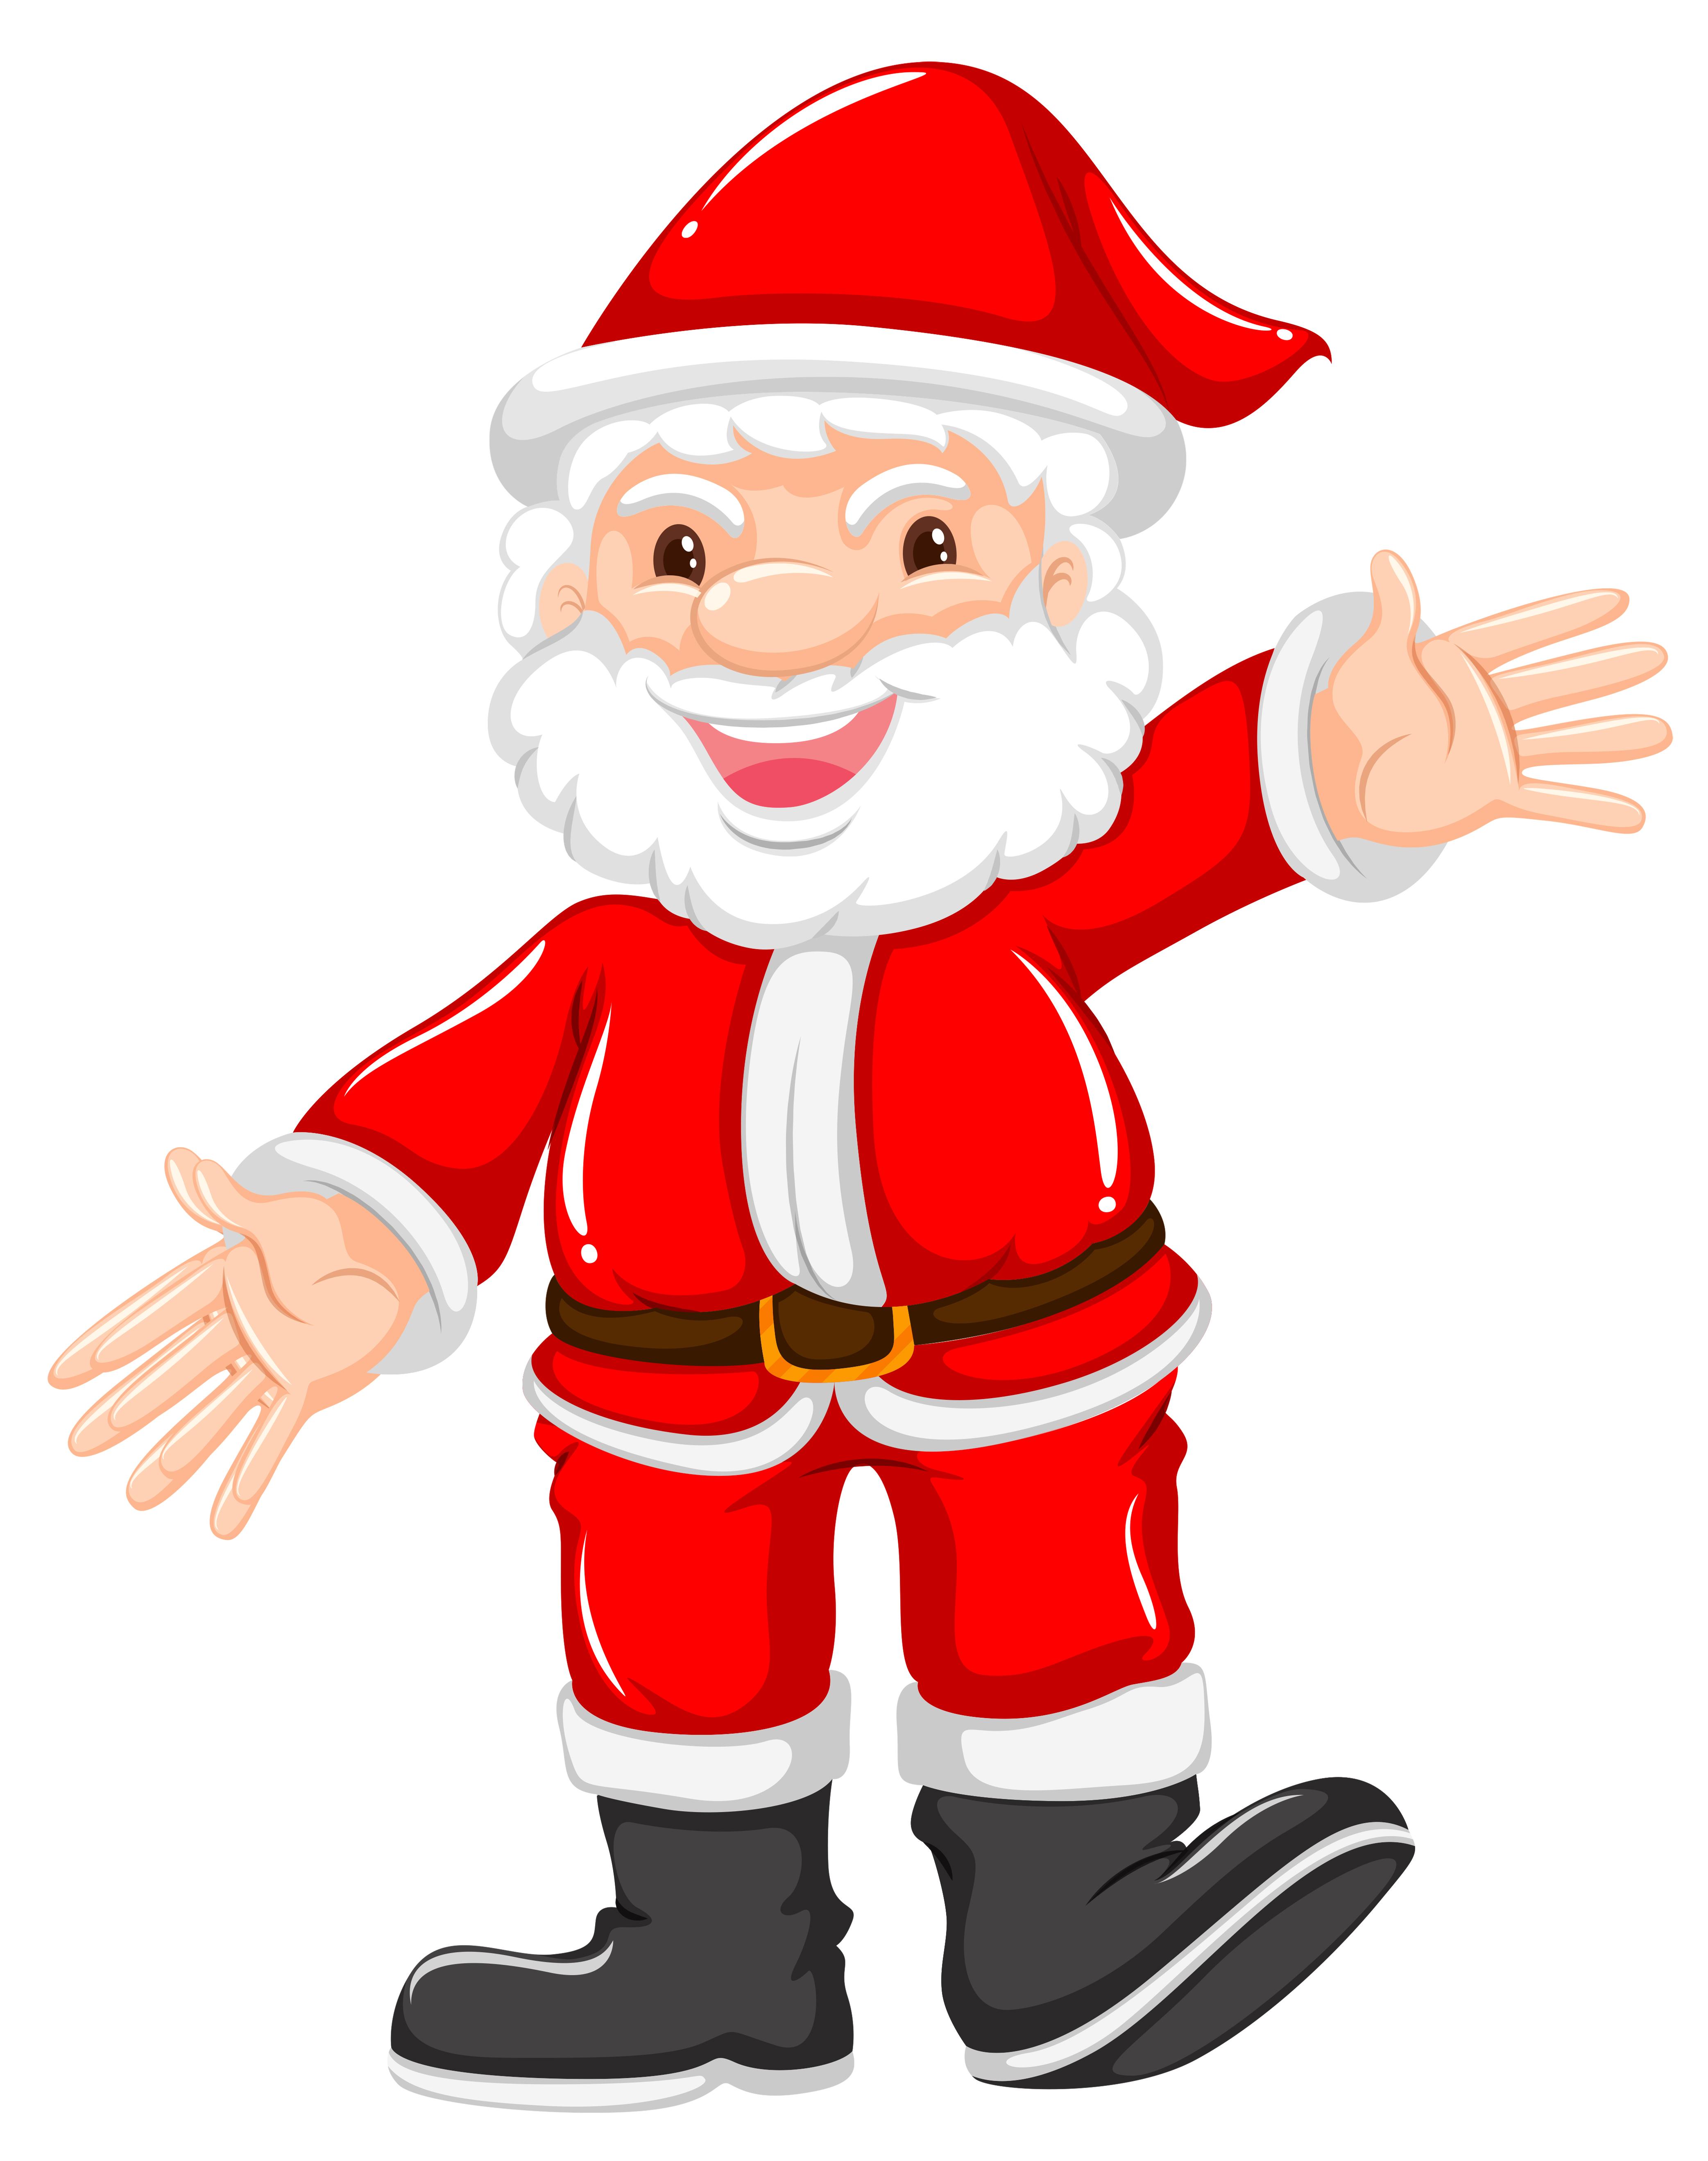 Happy santa in red suit - Download Free Vectors, Clipart ...